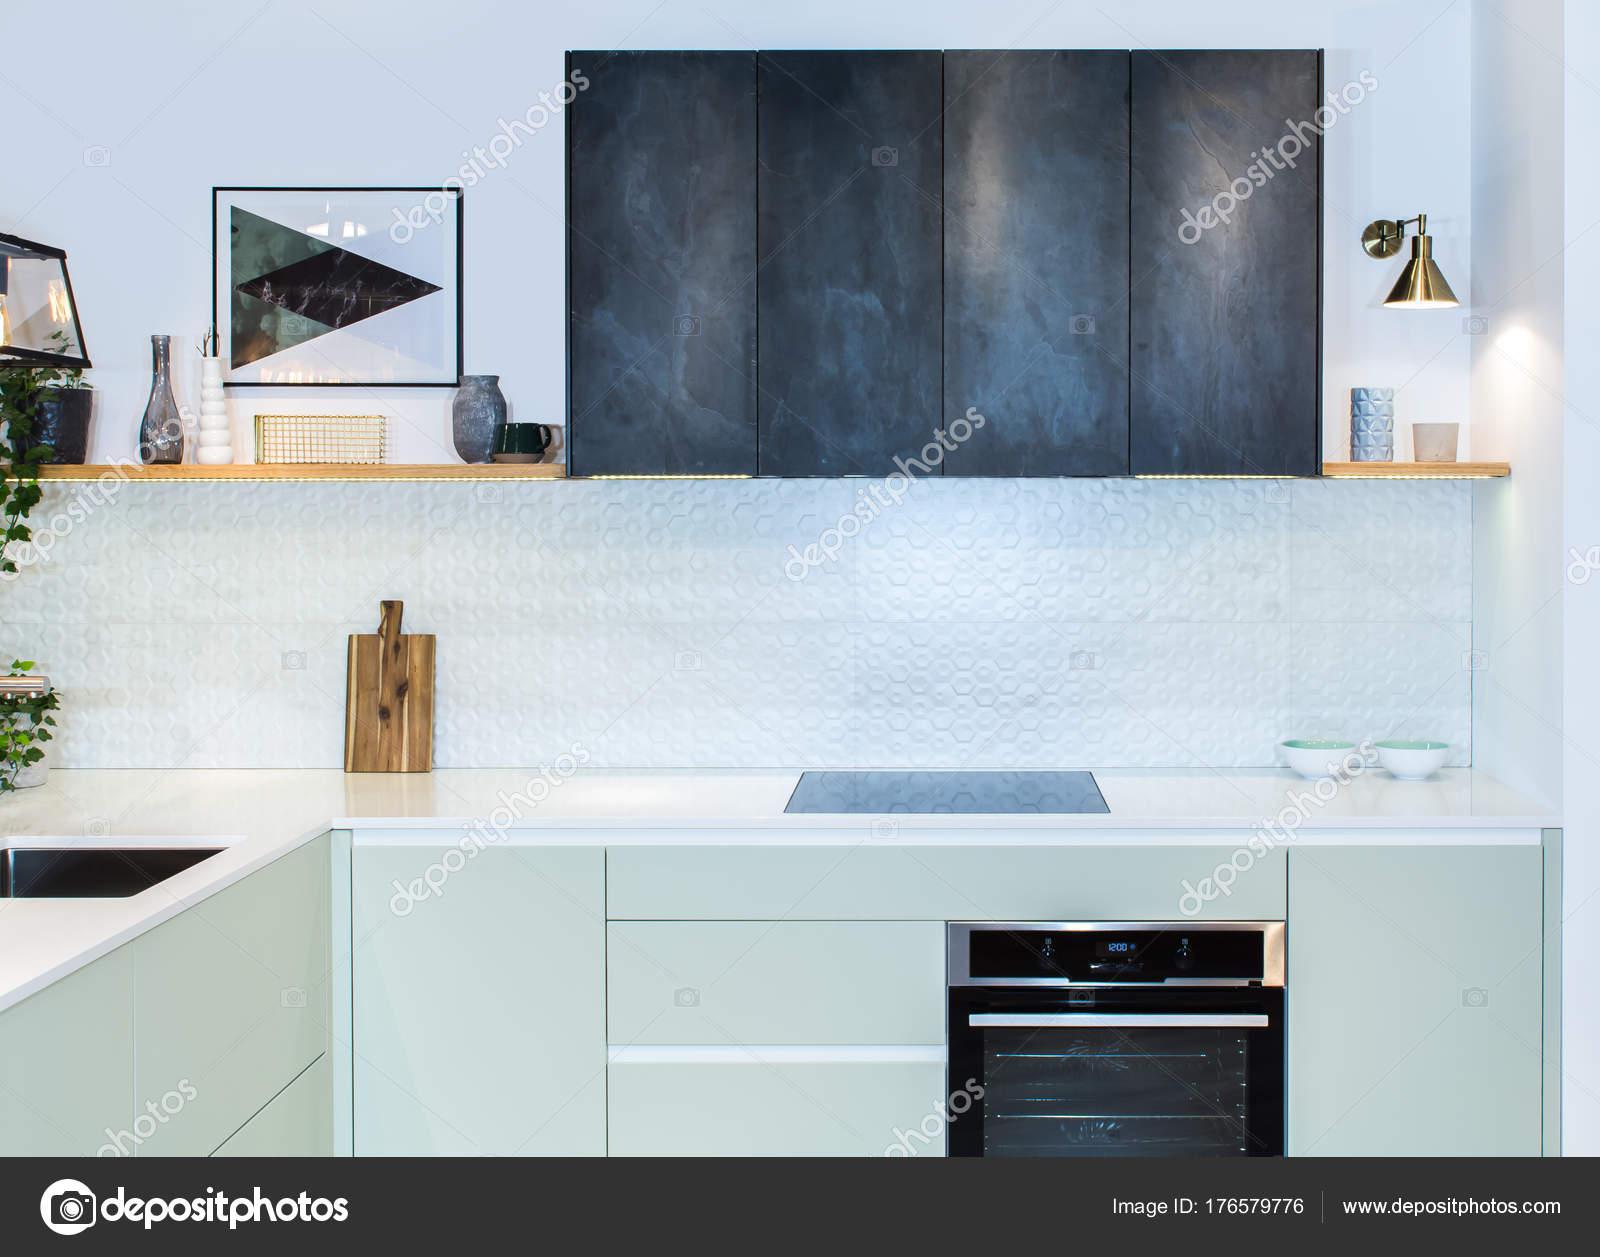 Casa moderna interni cucina great ambiente unico cucina for Colori interni casa moderna